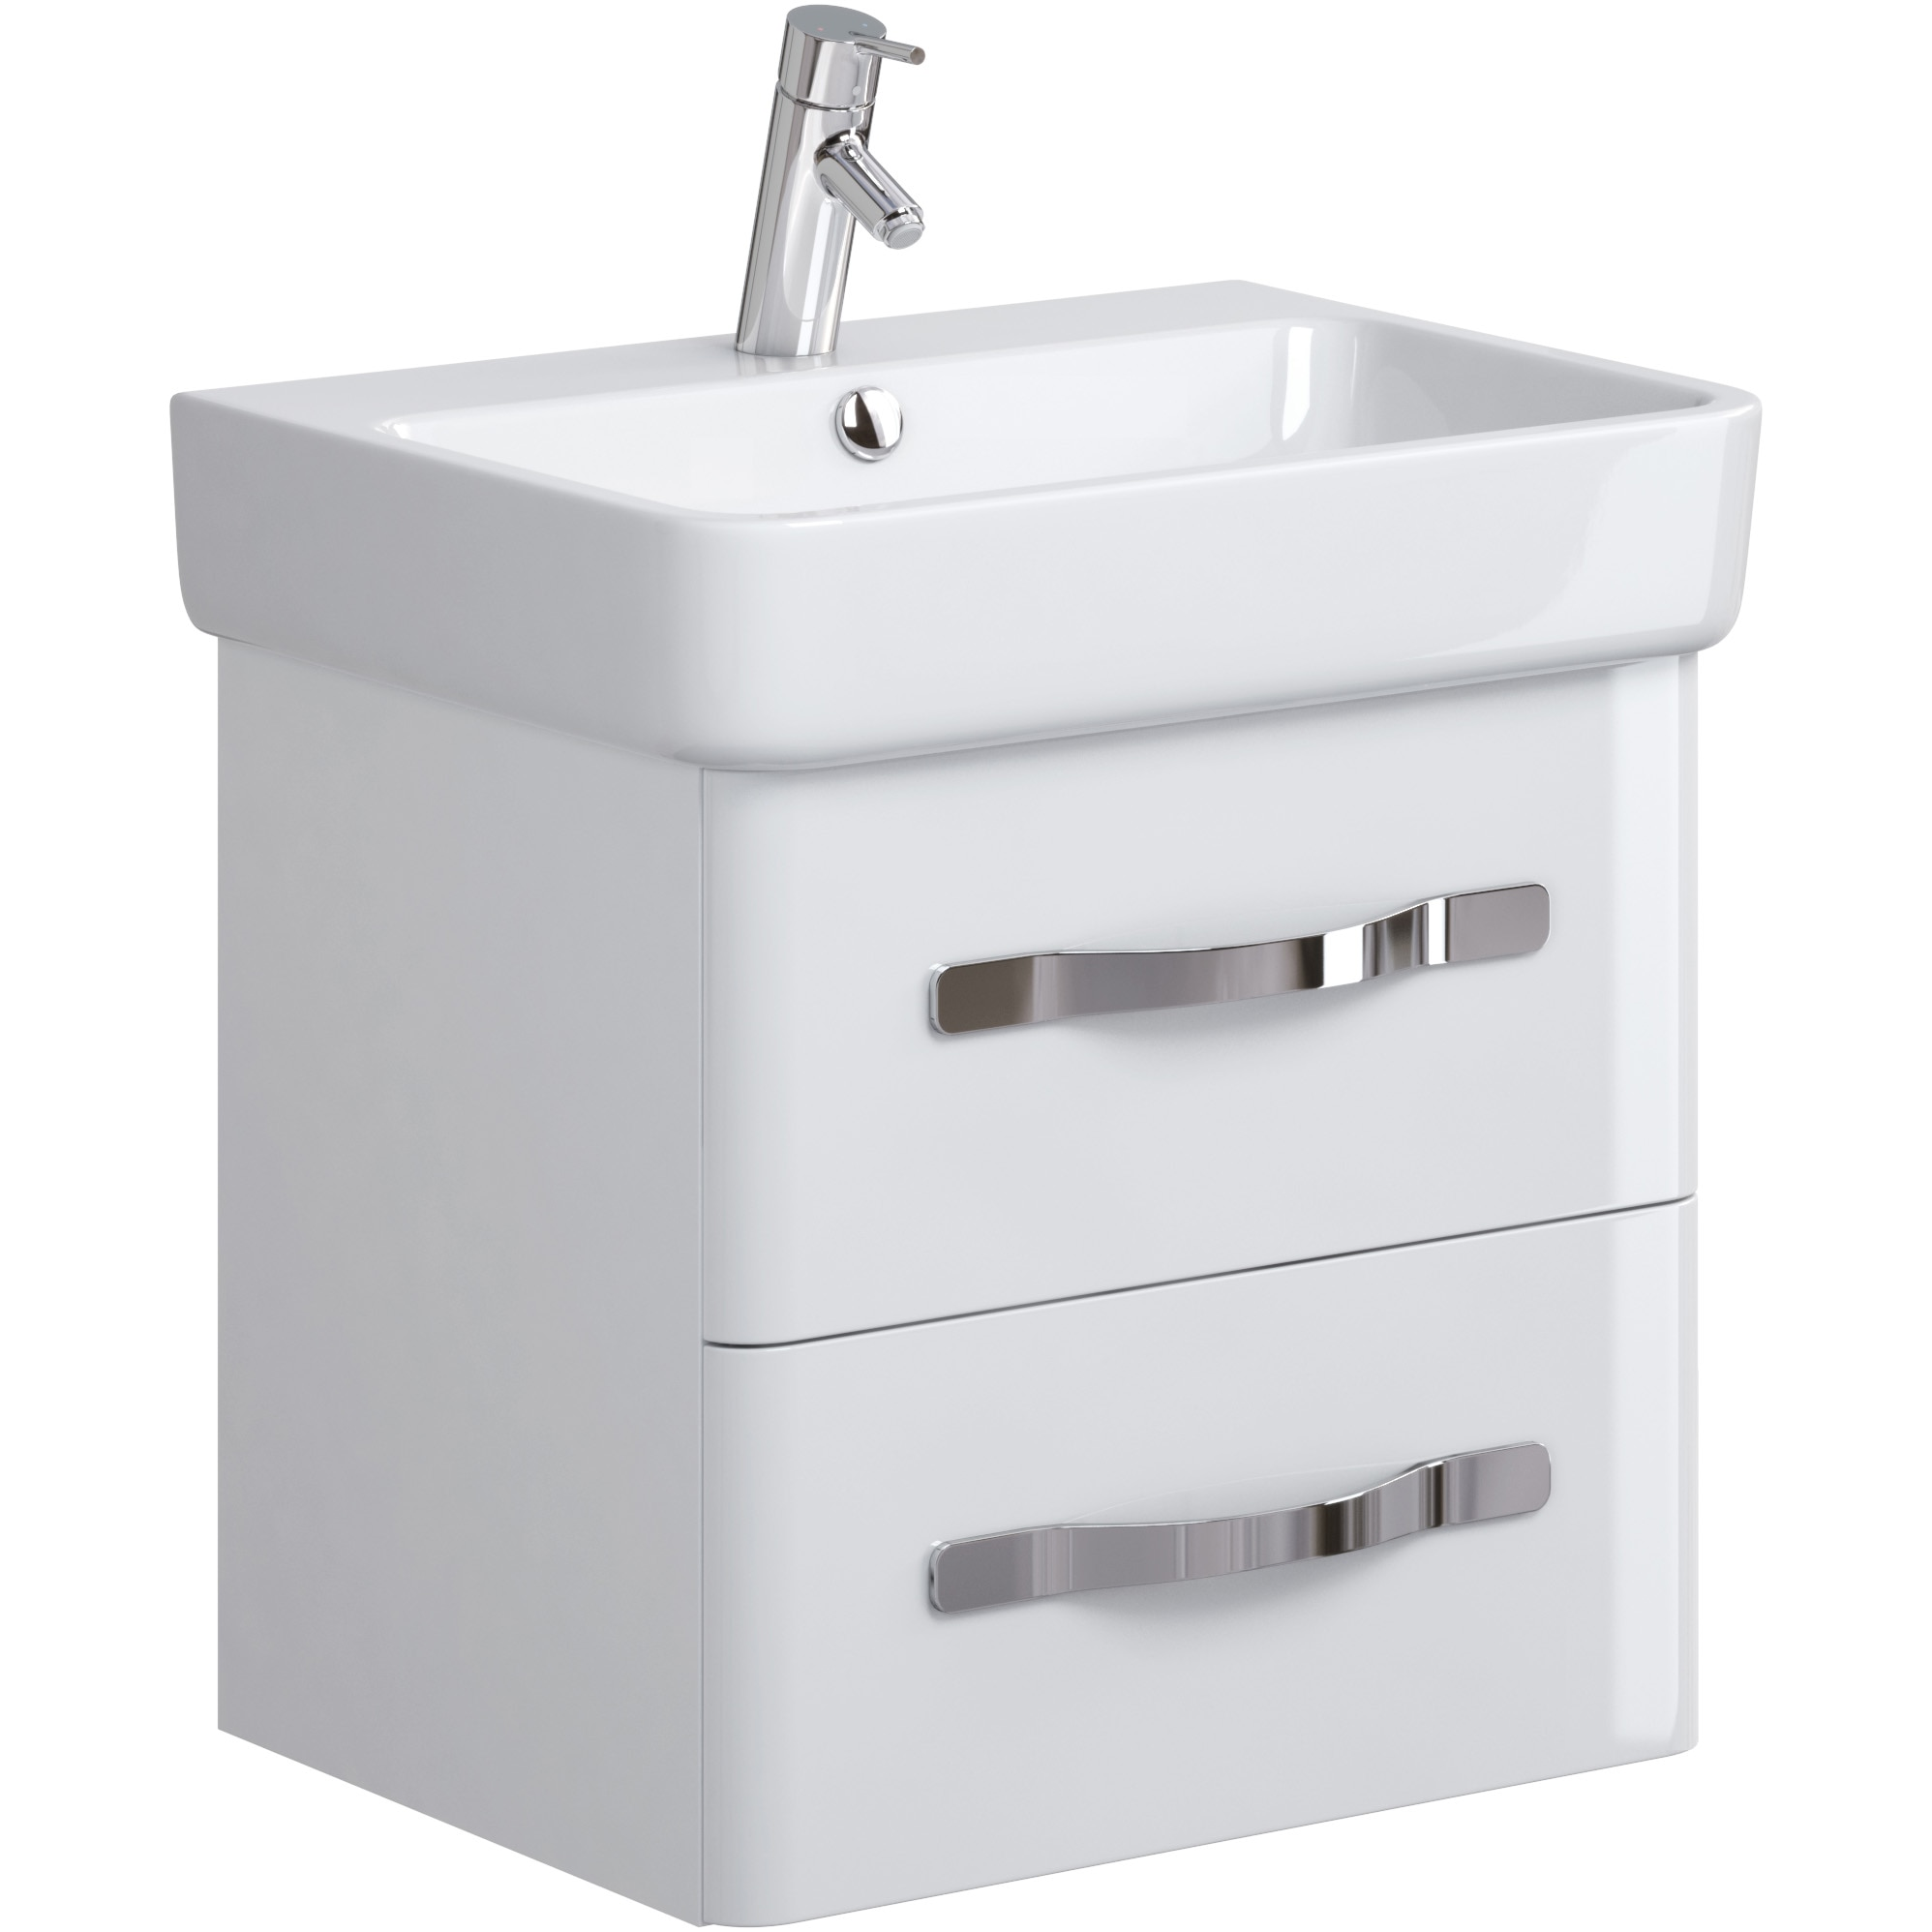 Fotografie Mobilier pentru lavoar Cersanit Urban Harmony OS580-001, 54x42x50 cm, alb, montat